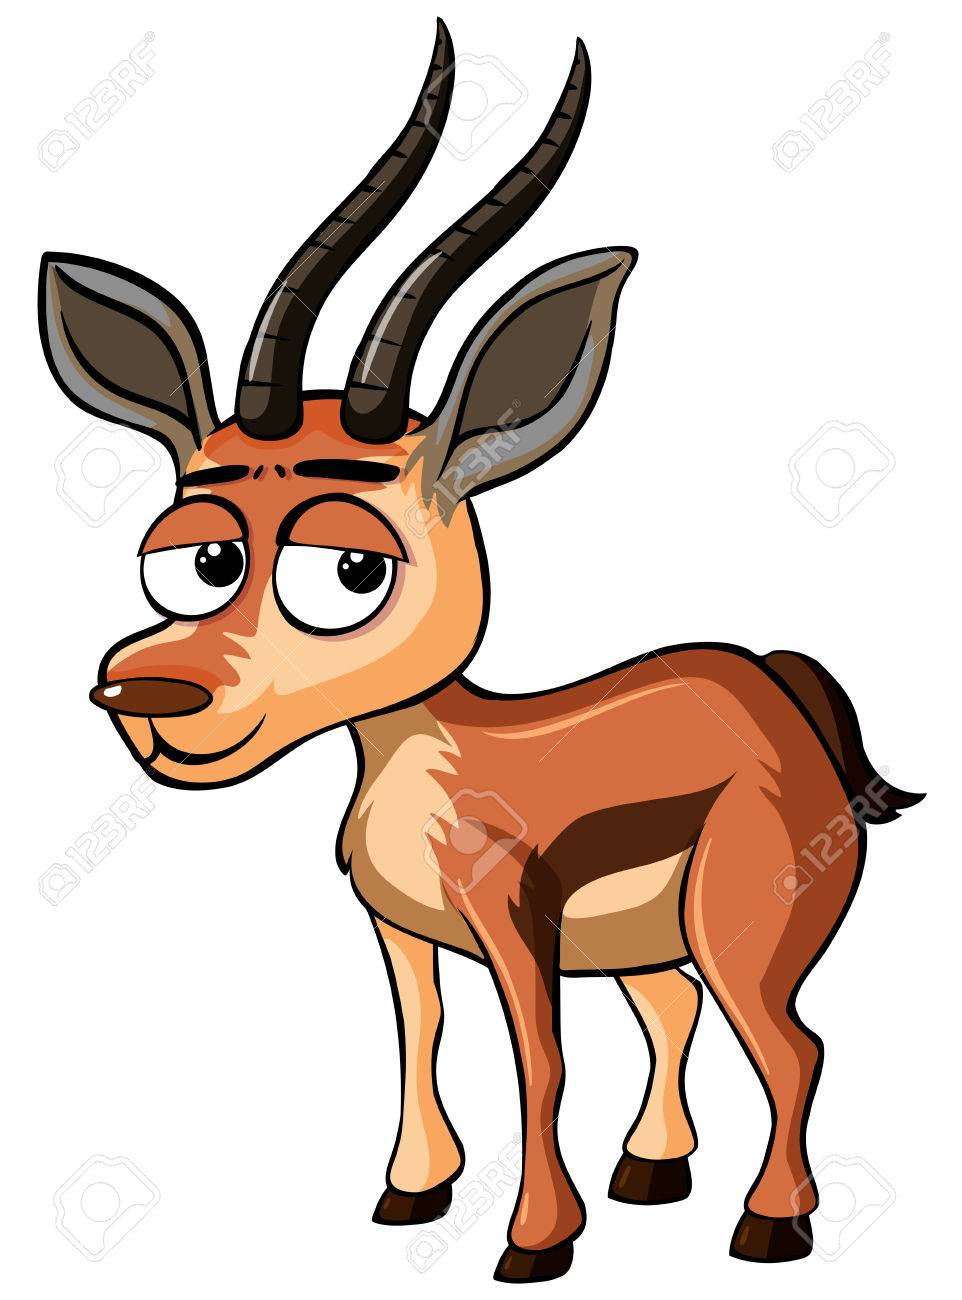 Gazelle with sad face illustration Stock Vector - 83683364